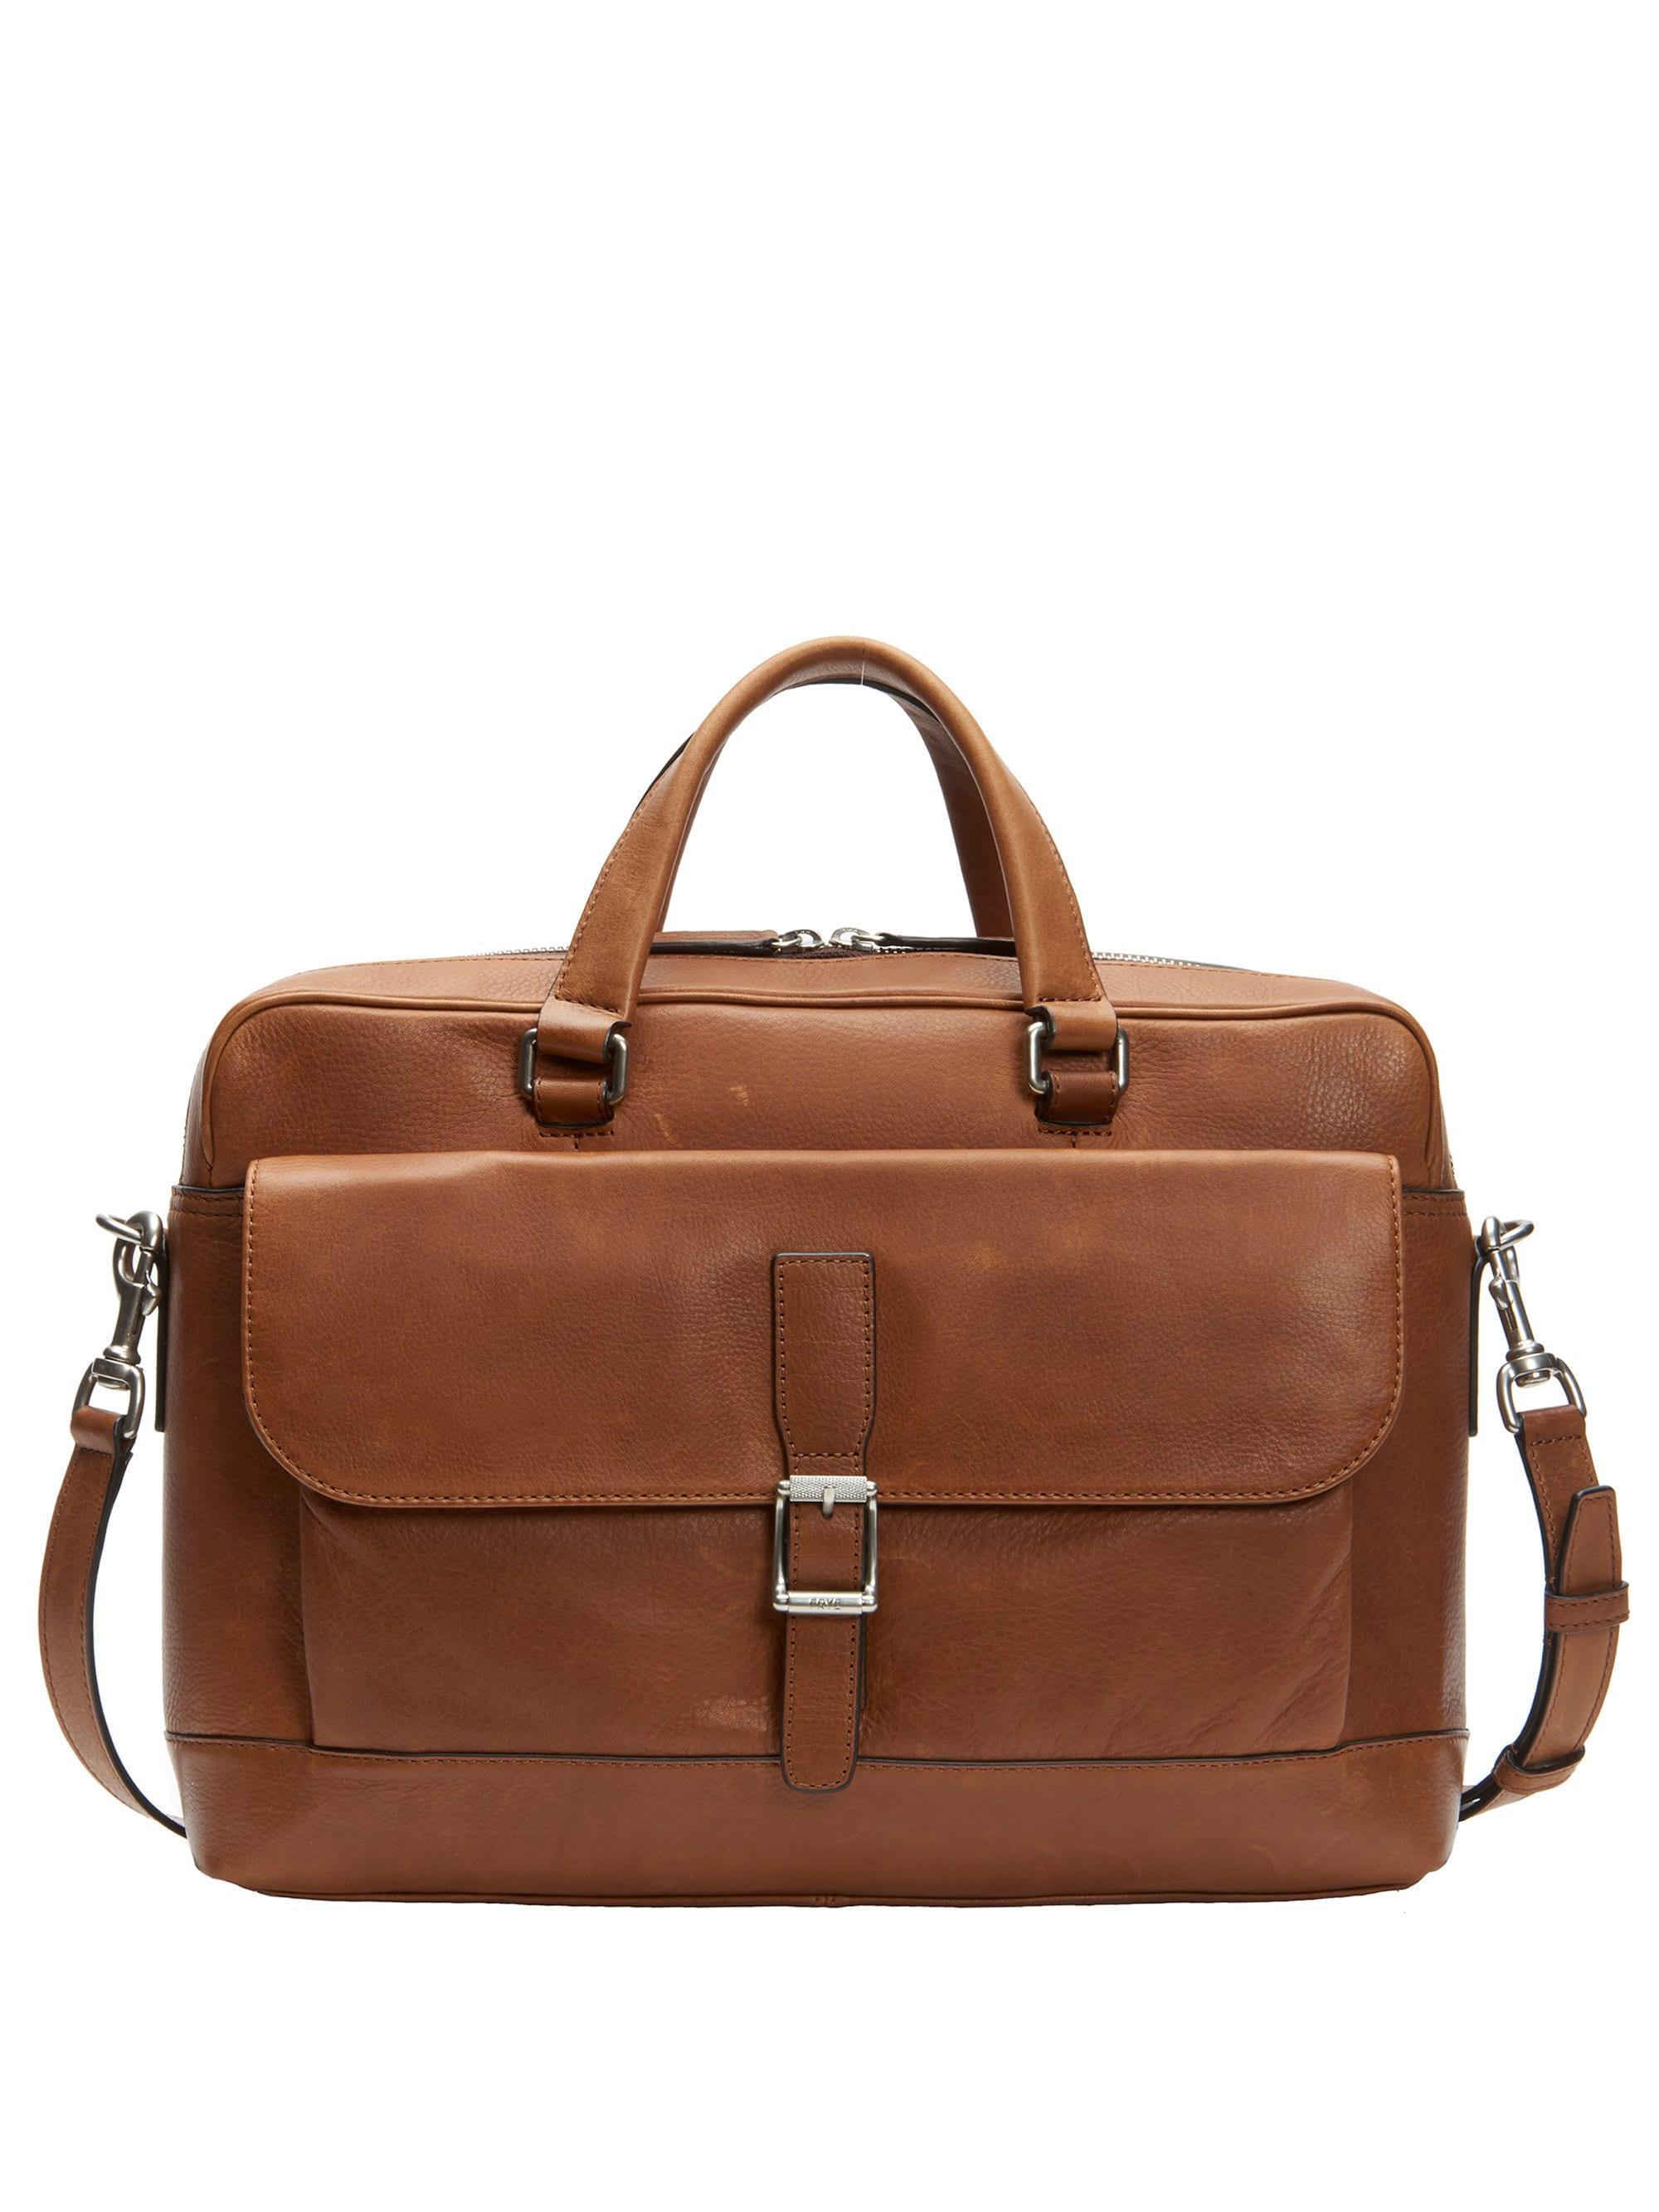 5a2f89883f8d Frye Men's Oliver Two-handle Leather Messenger Bag - Cognac in Brown ...